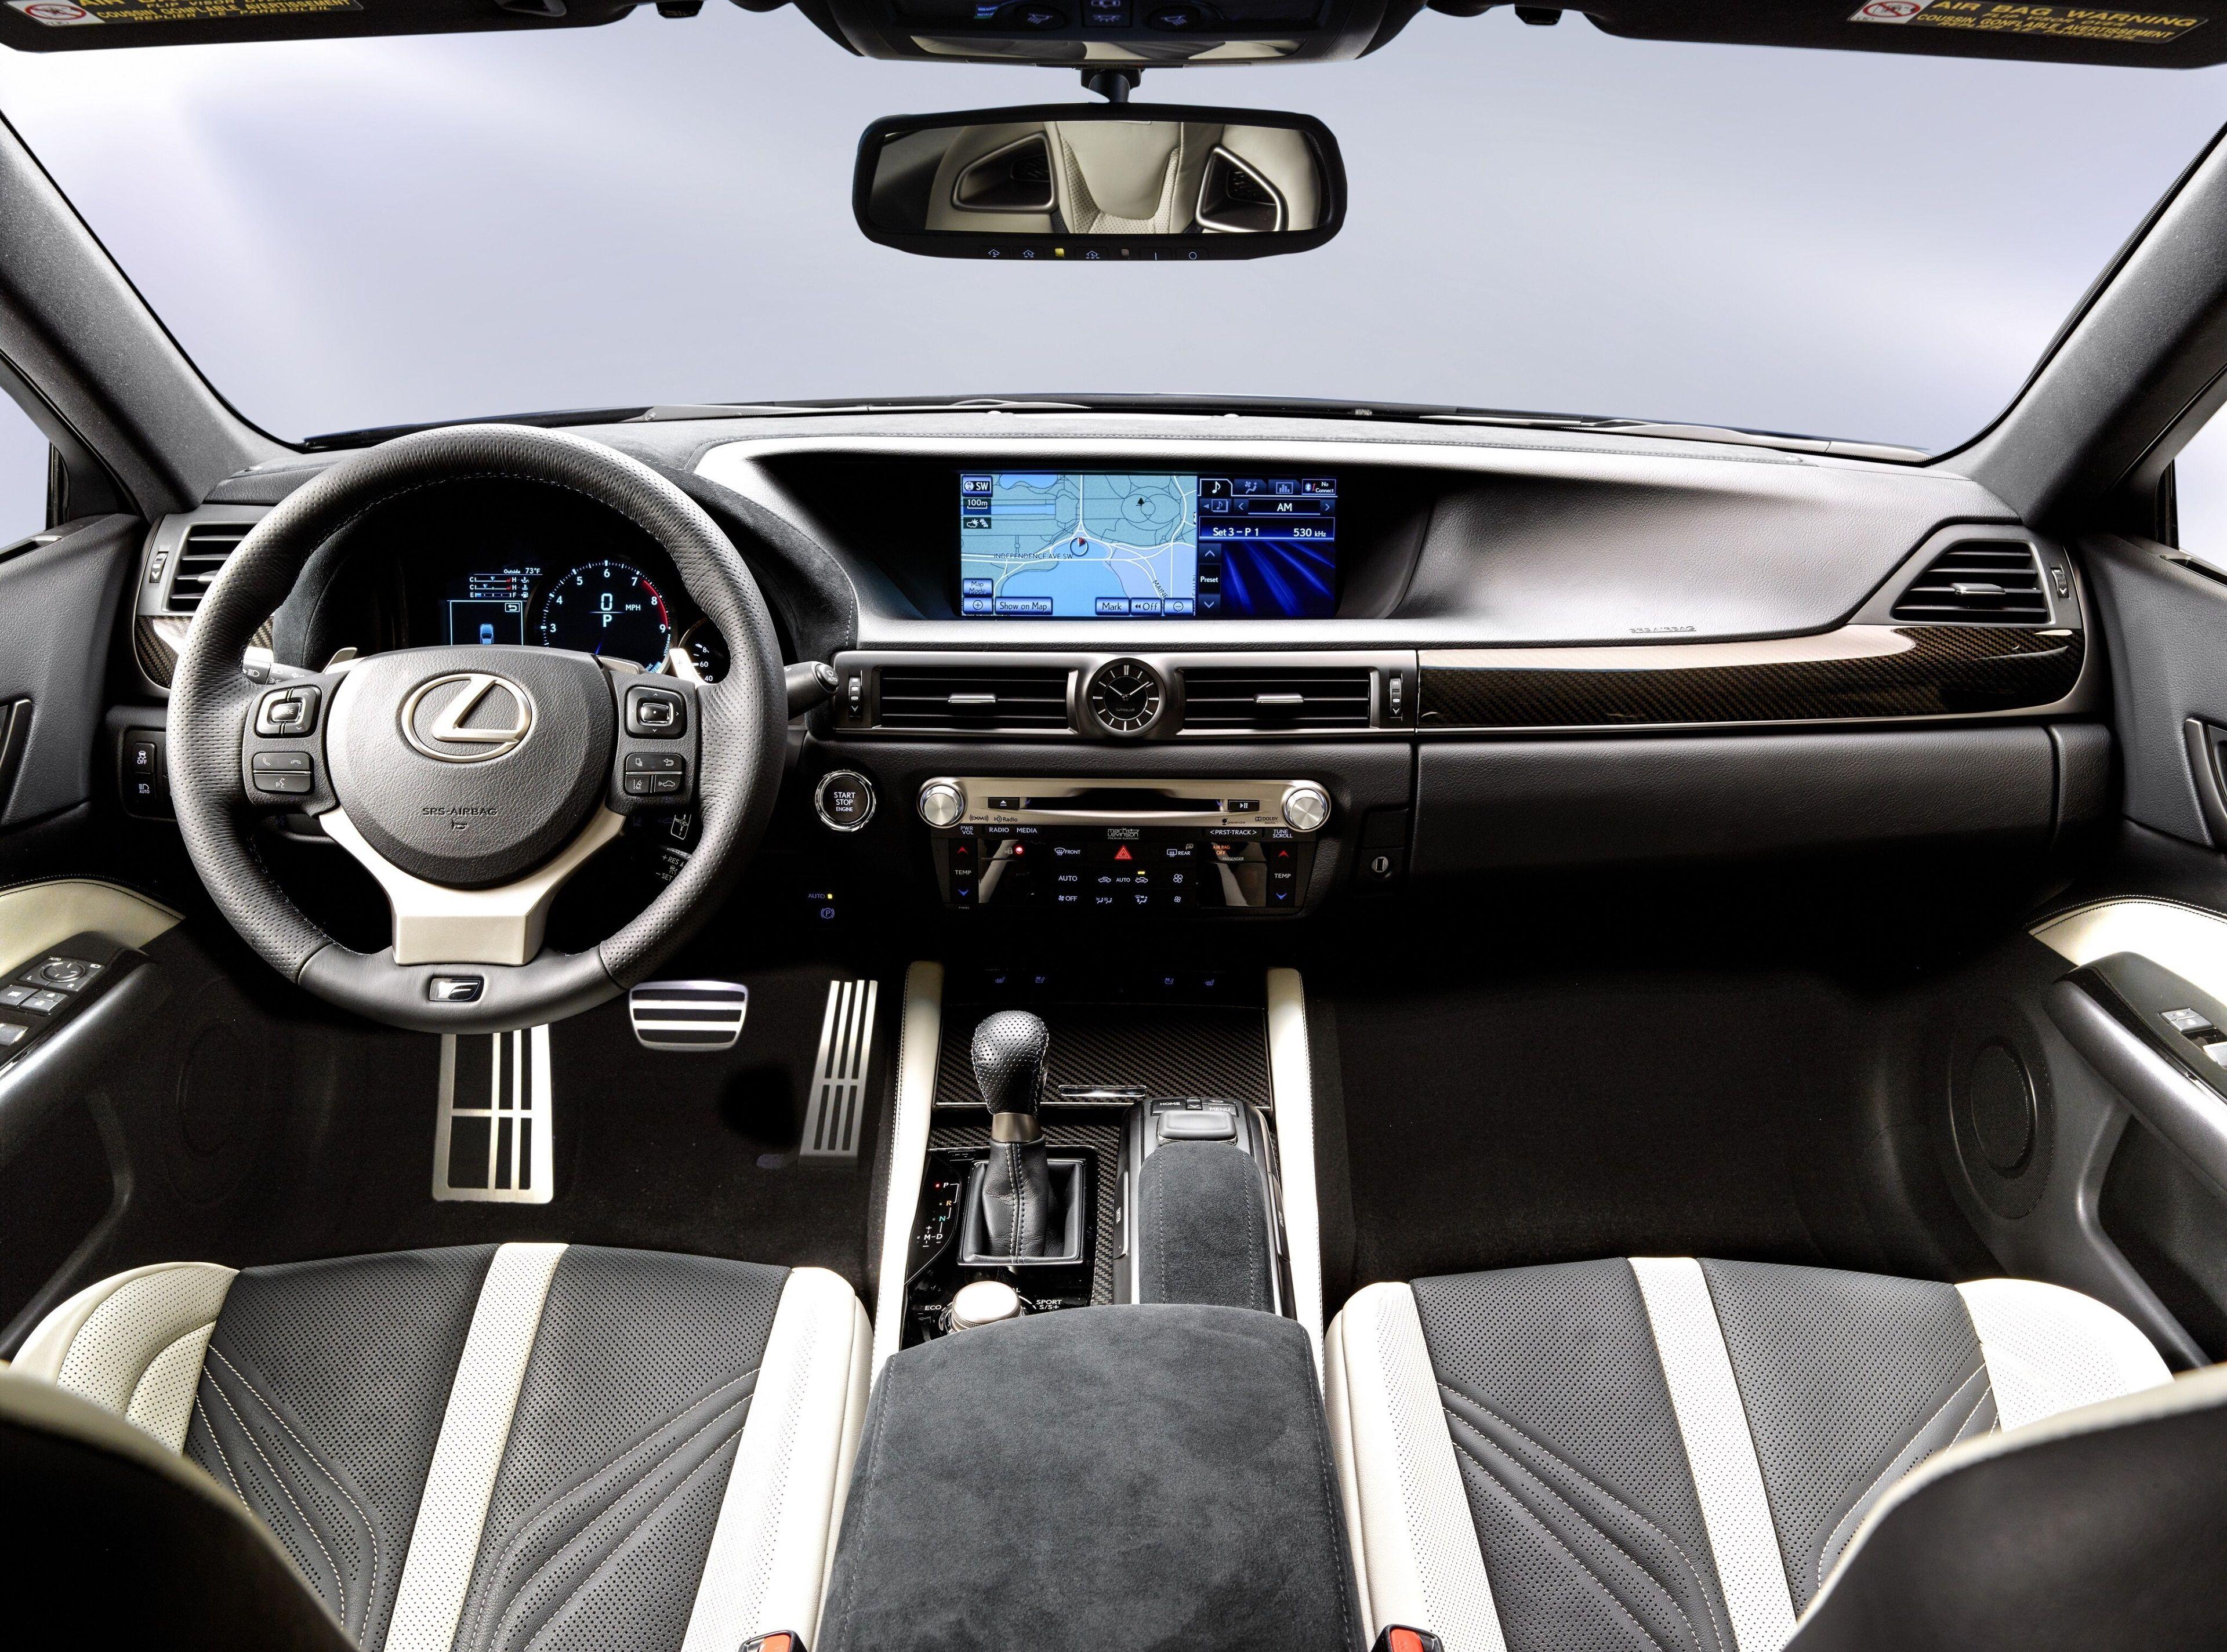 3840x2849 Lexus Gs F 4k Wallpaper Image Free Download Dream Cars